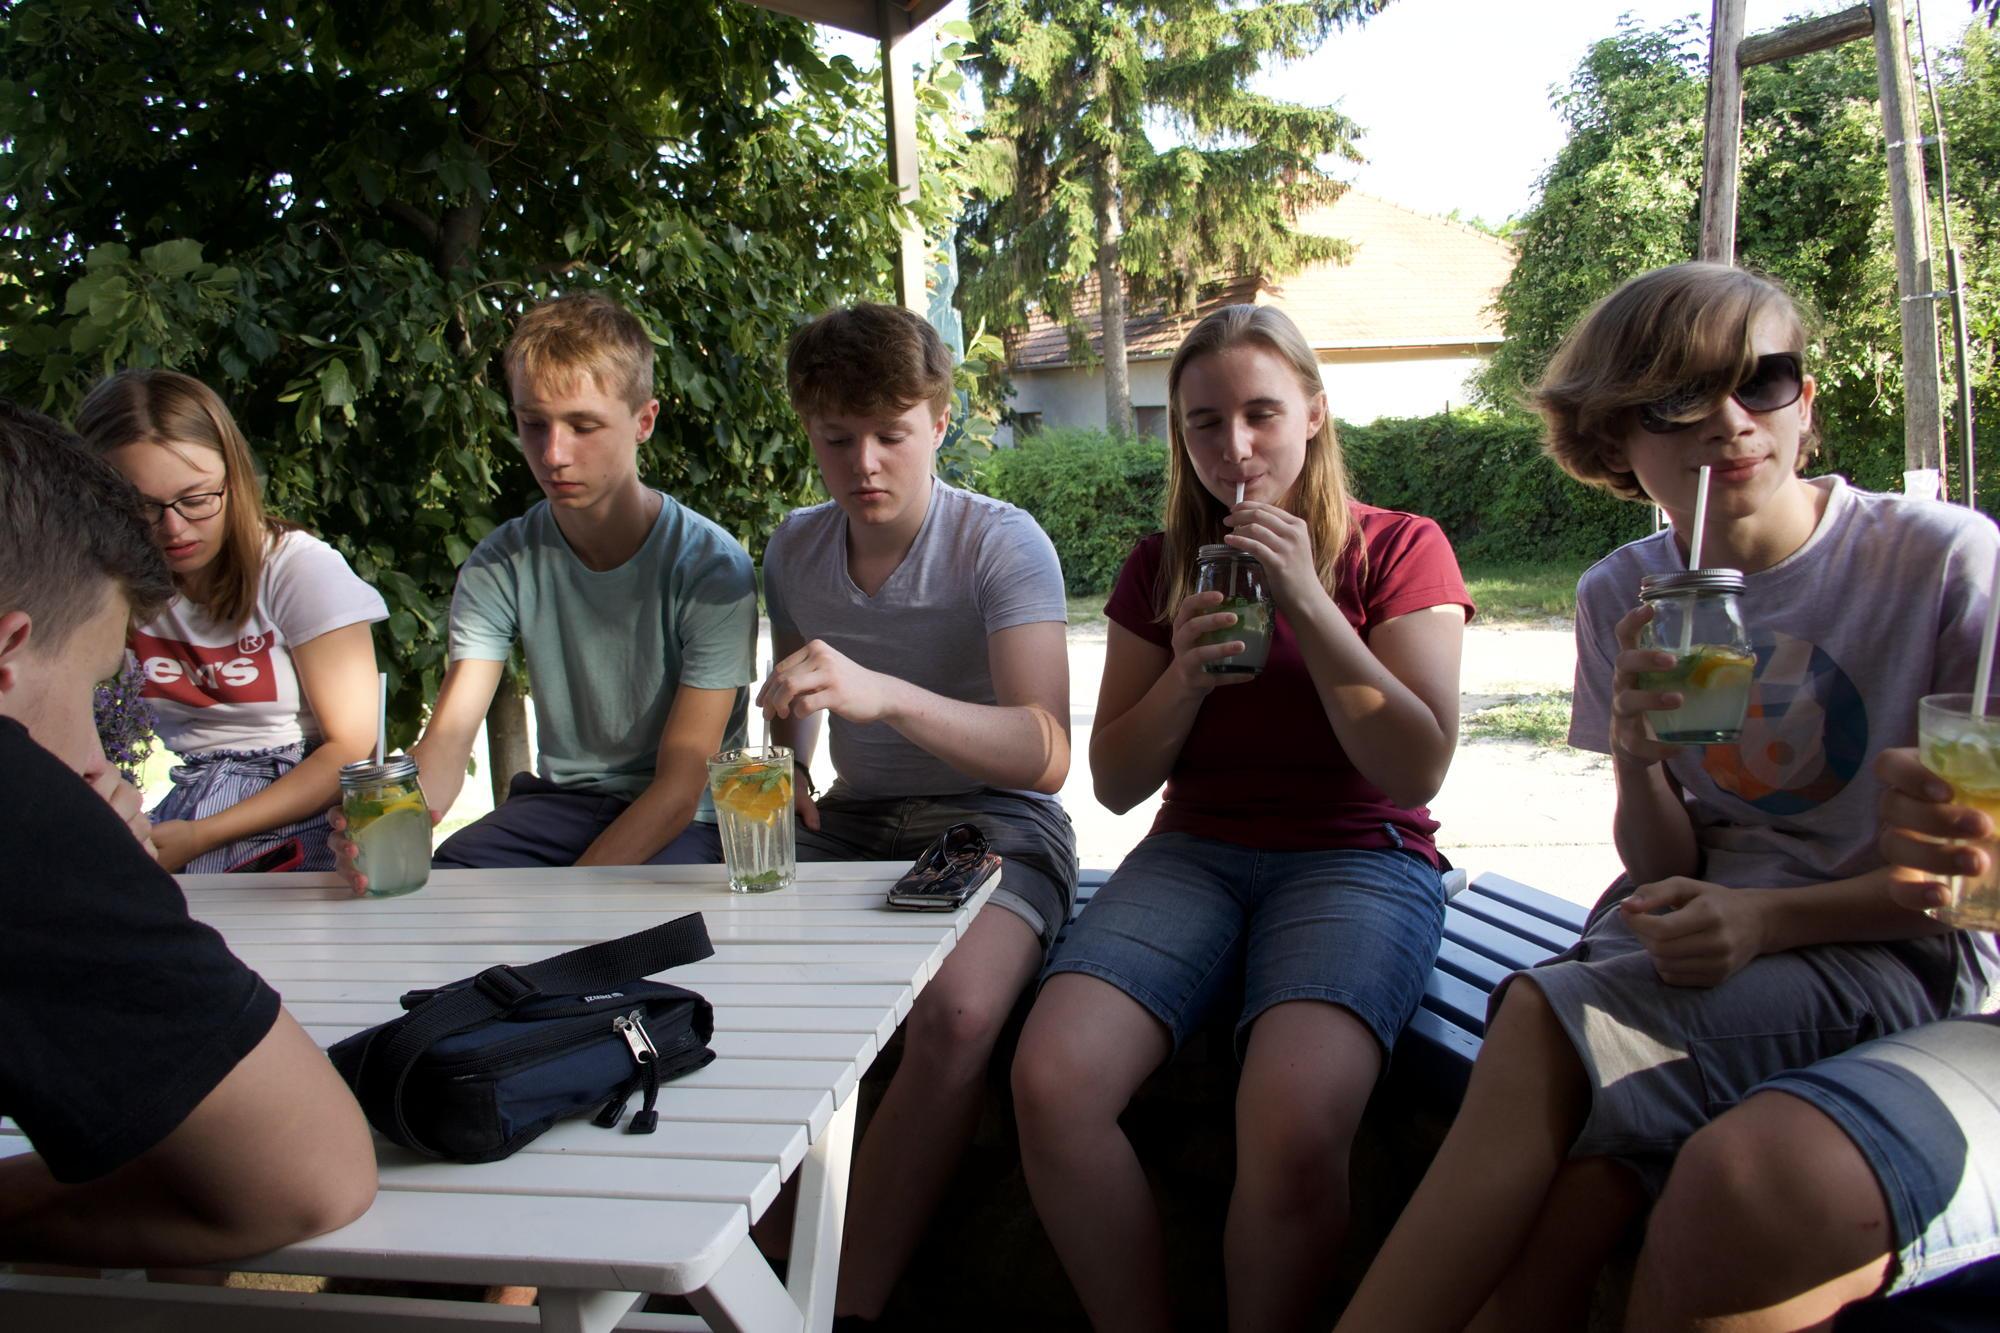 Sitzgruppe mit Limo.jpg